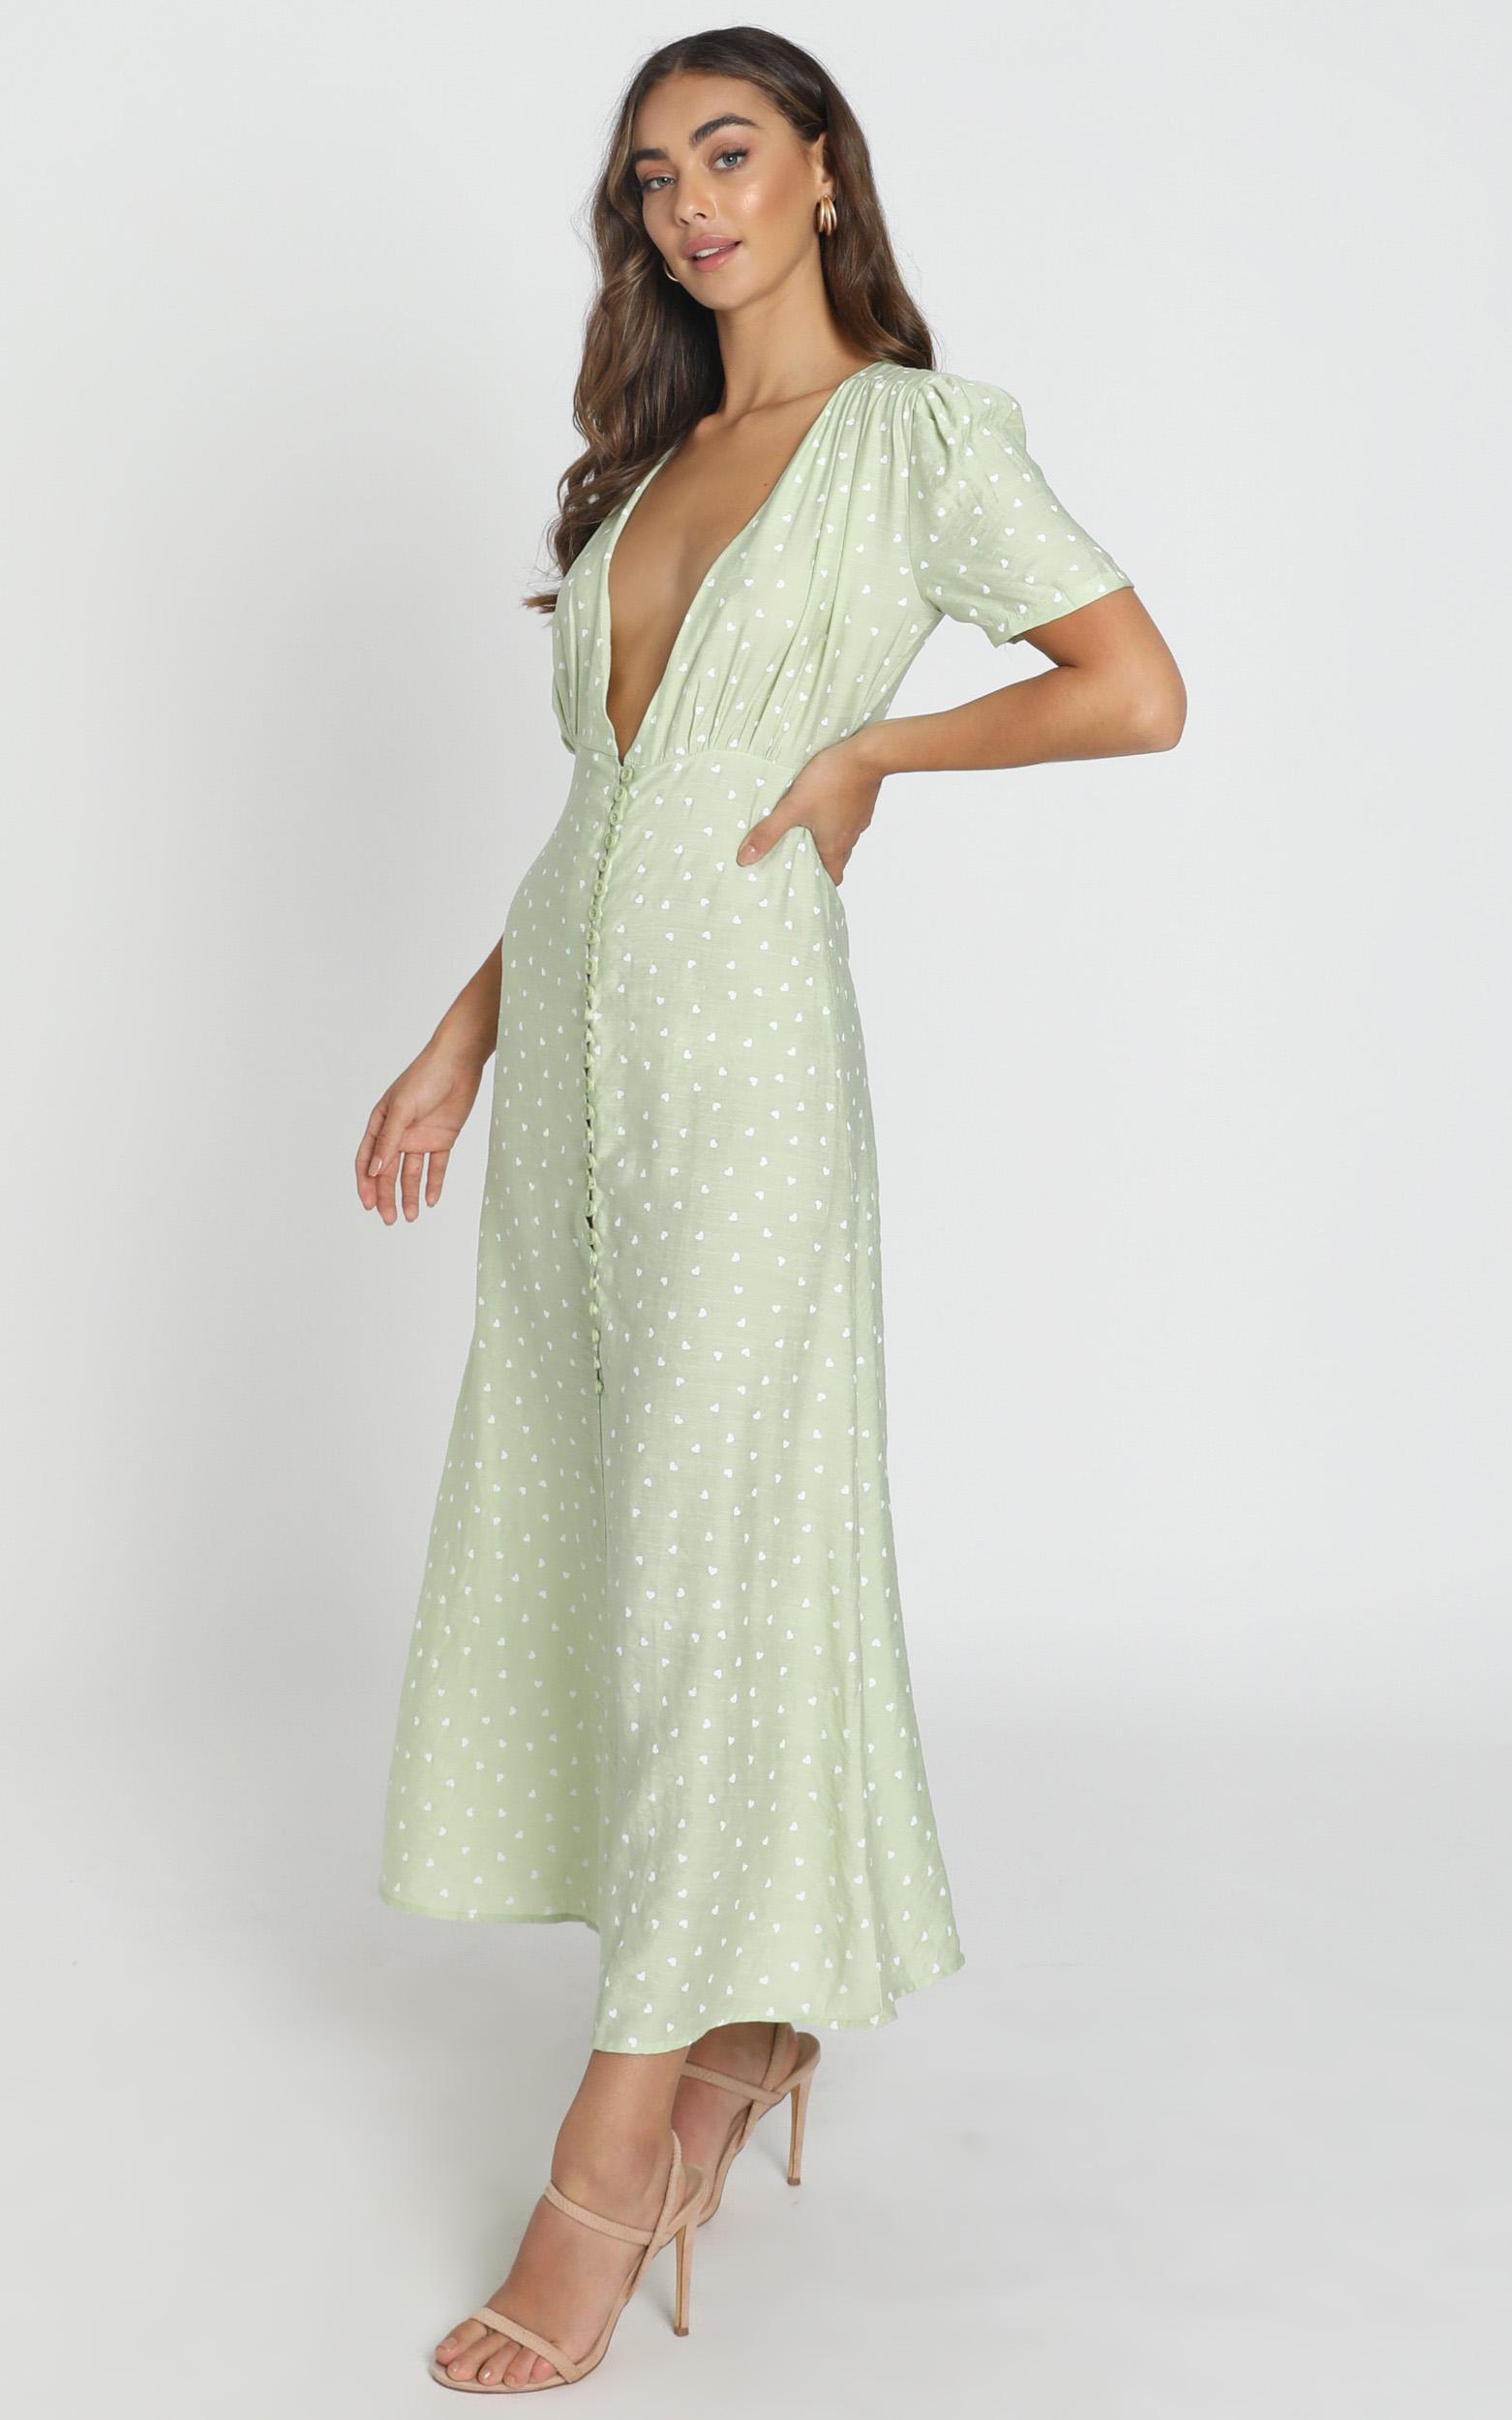 Peri V Neck Midi Dress in green - 6 (XS), Green, hi-res image number null